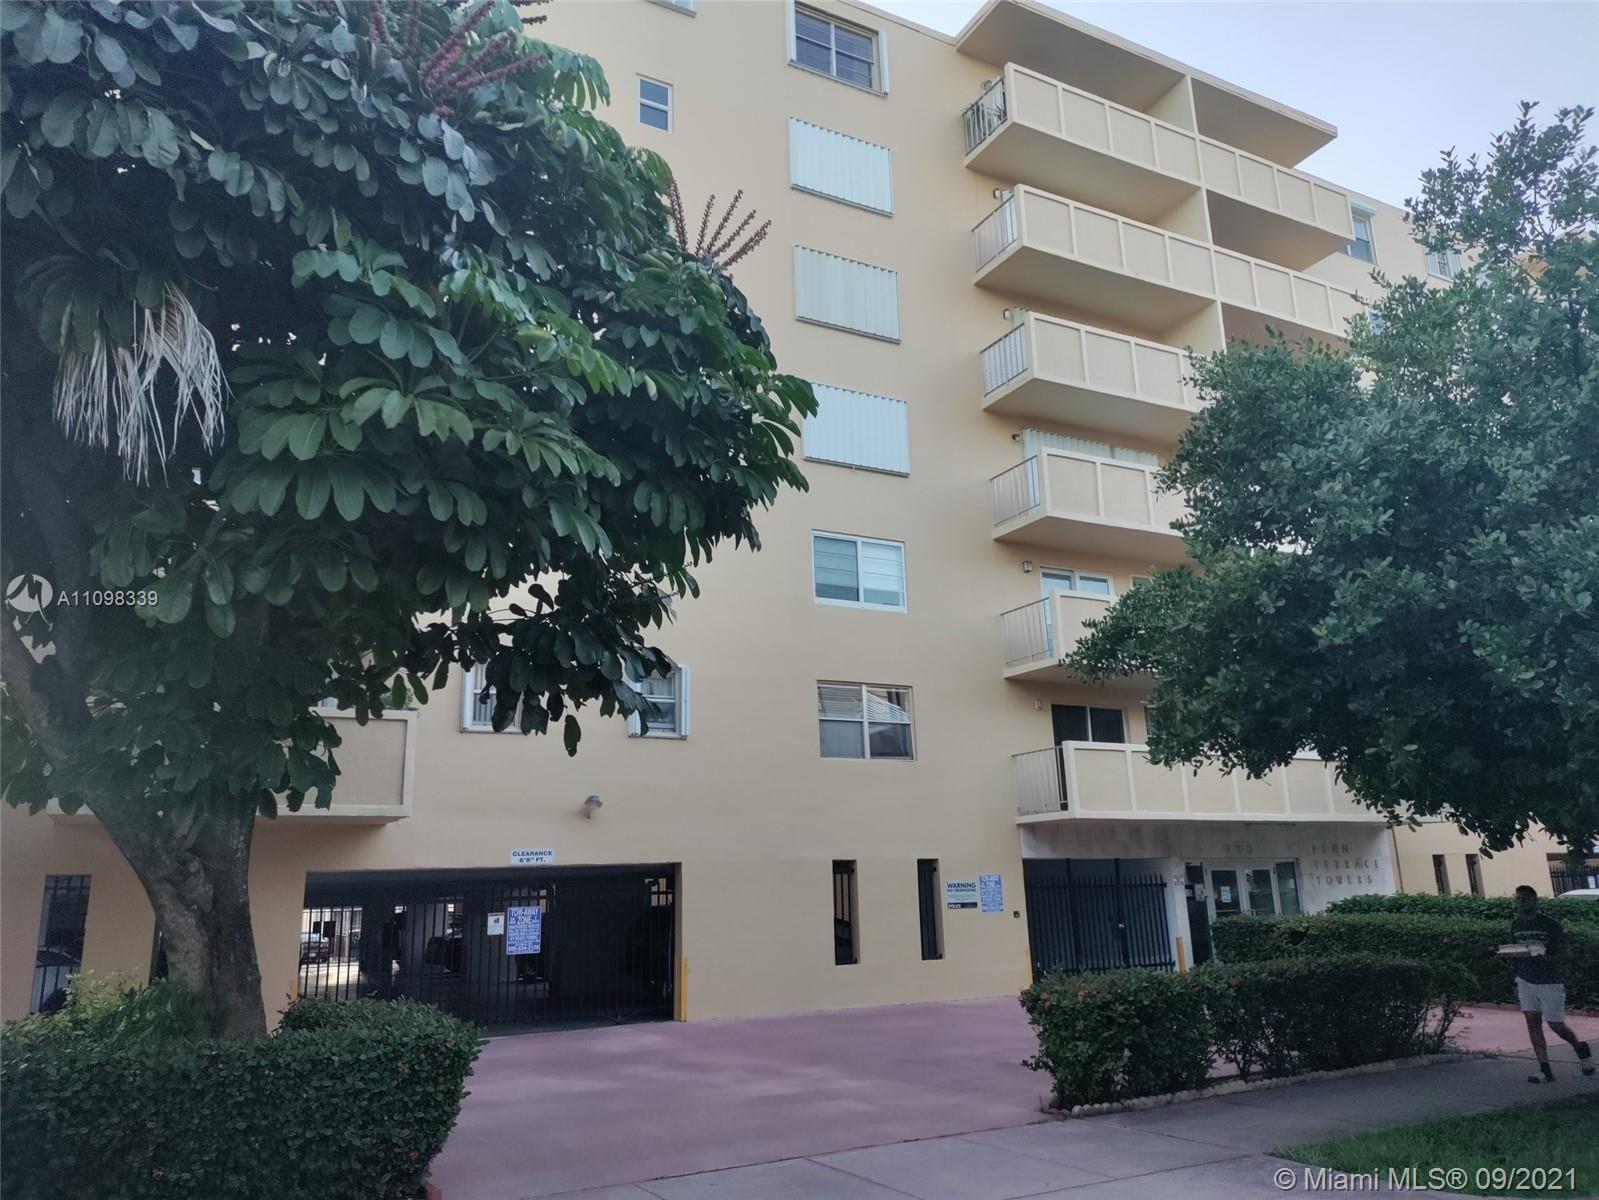 730 Pennsylvania Ave #312, Miami Beach, FL 33139 - #: A11098339